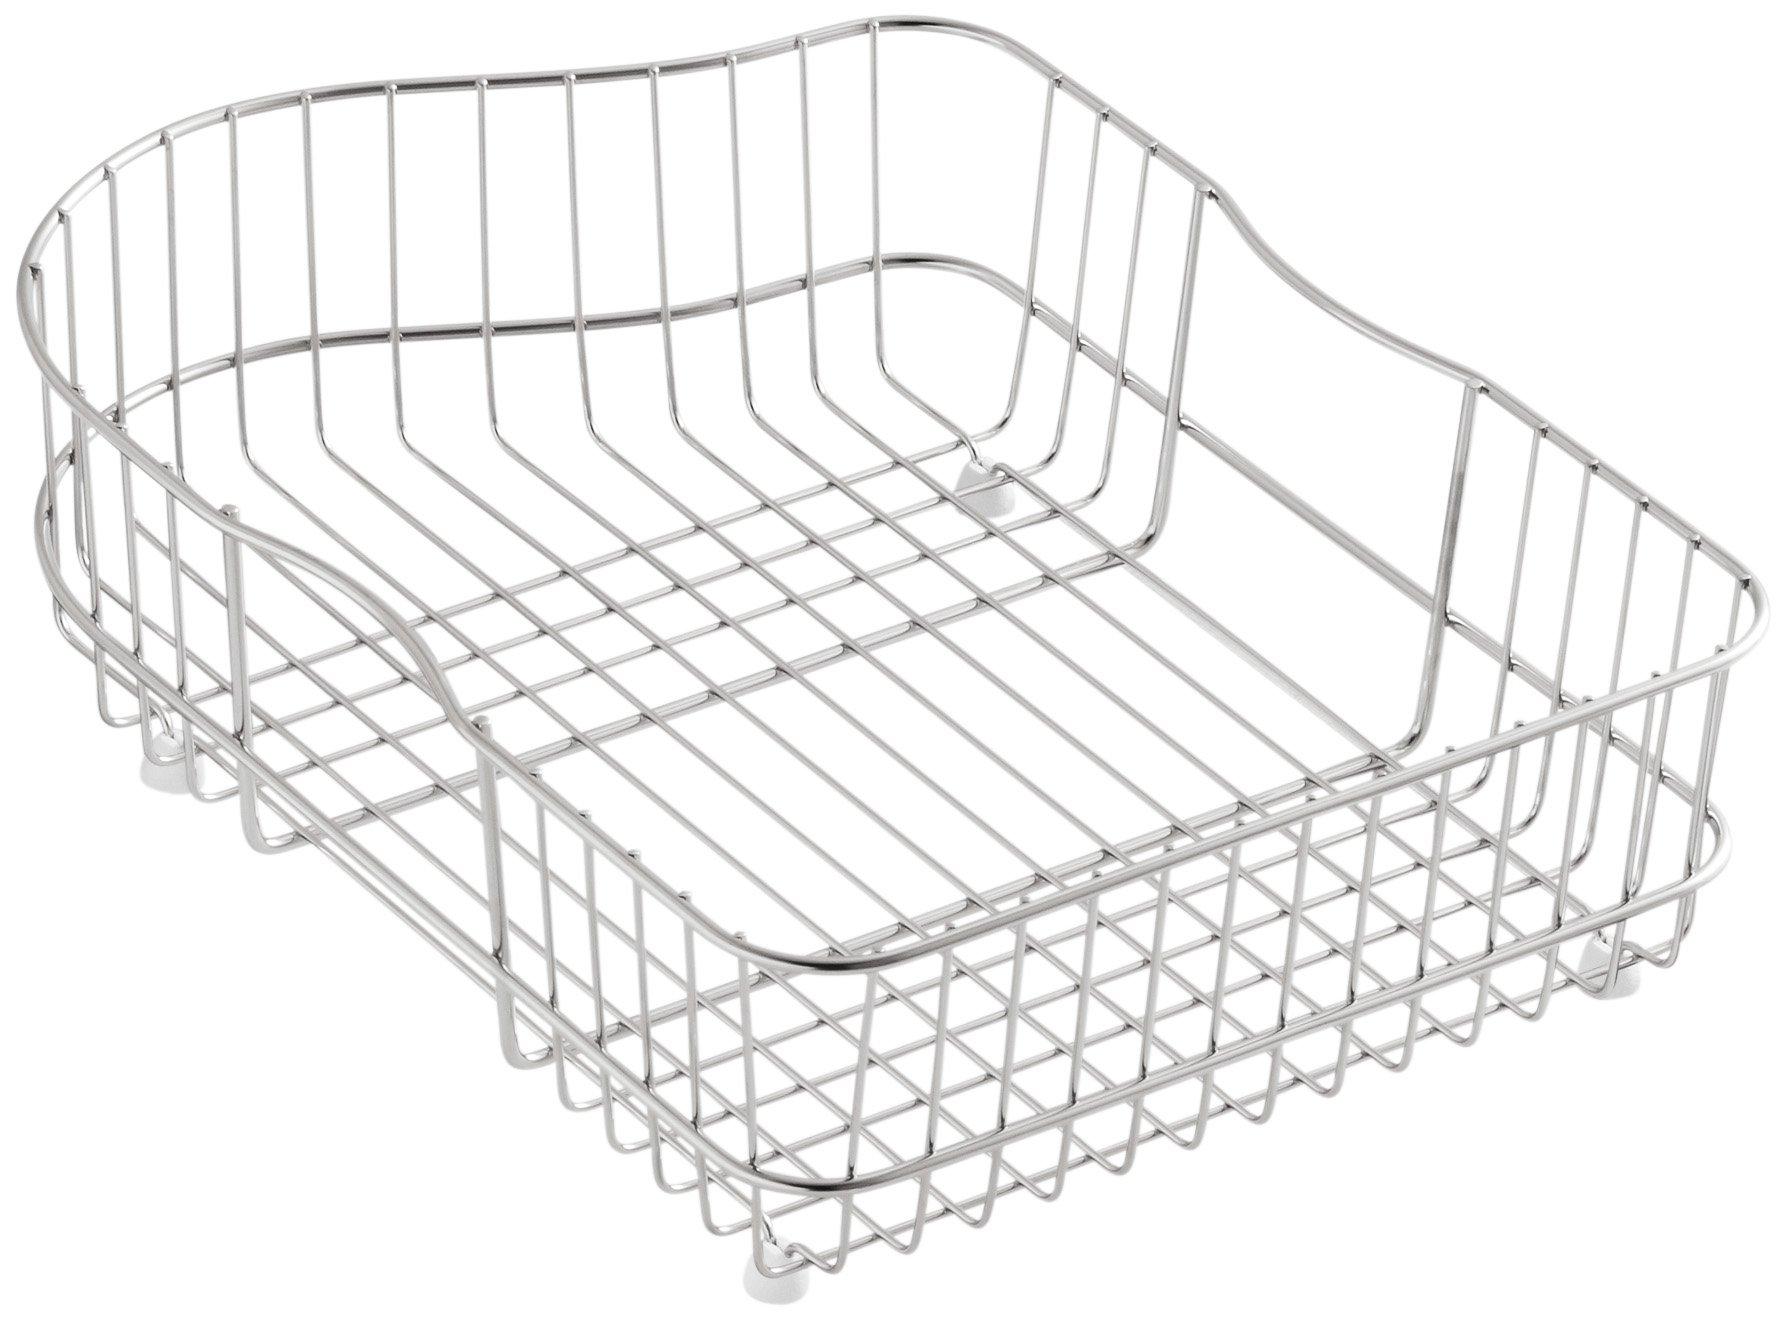 Kohler K-6603L-ST Hartland Wire Rinse Basket, Stainless Steel by Kohler